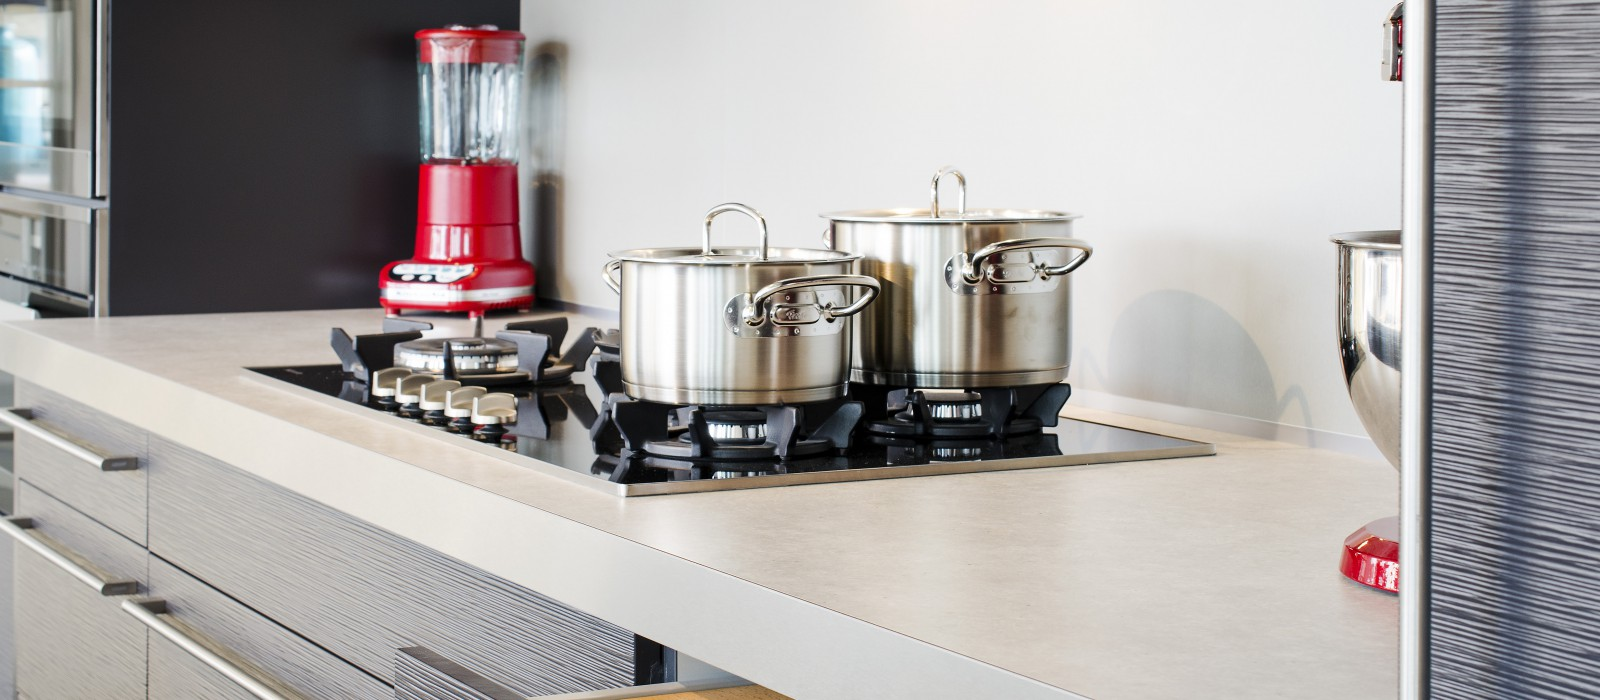 Weeteling Keukens